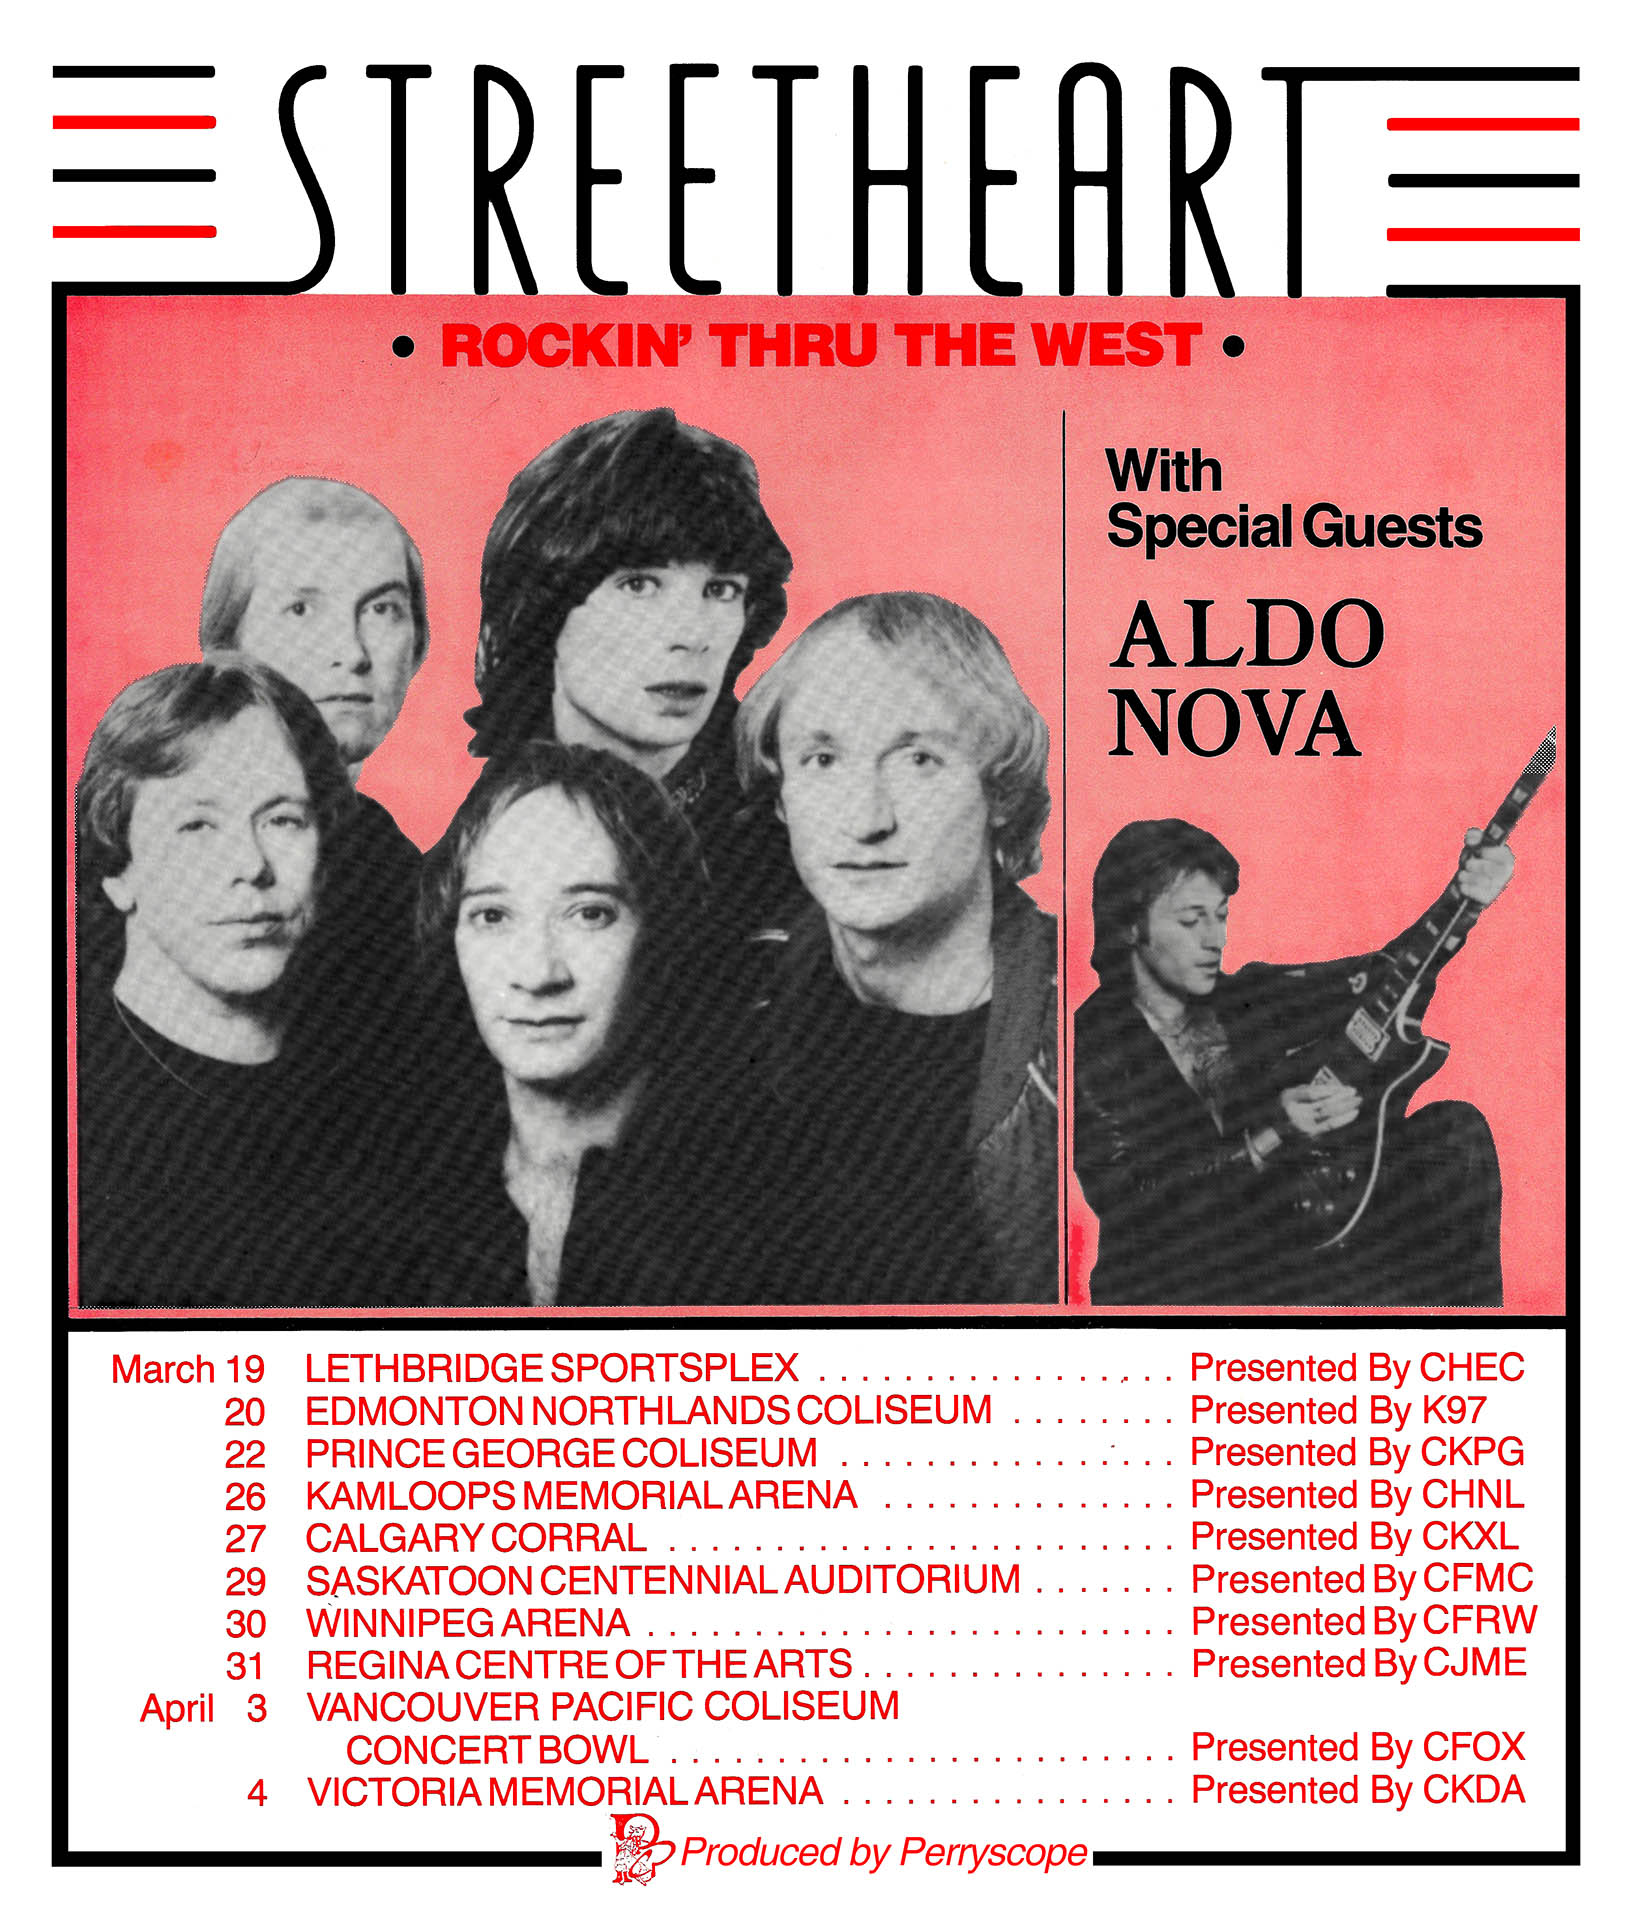 STREETHEART – 1982